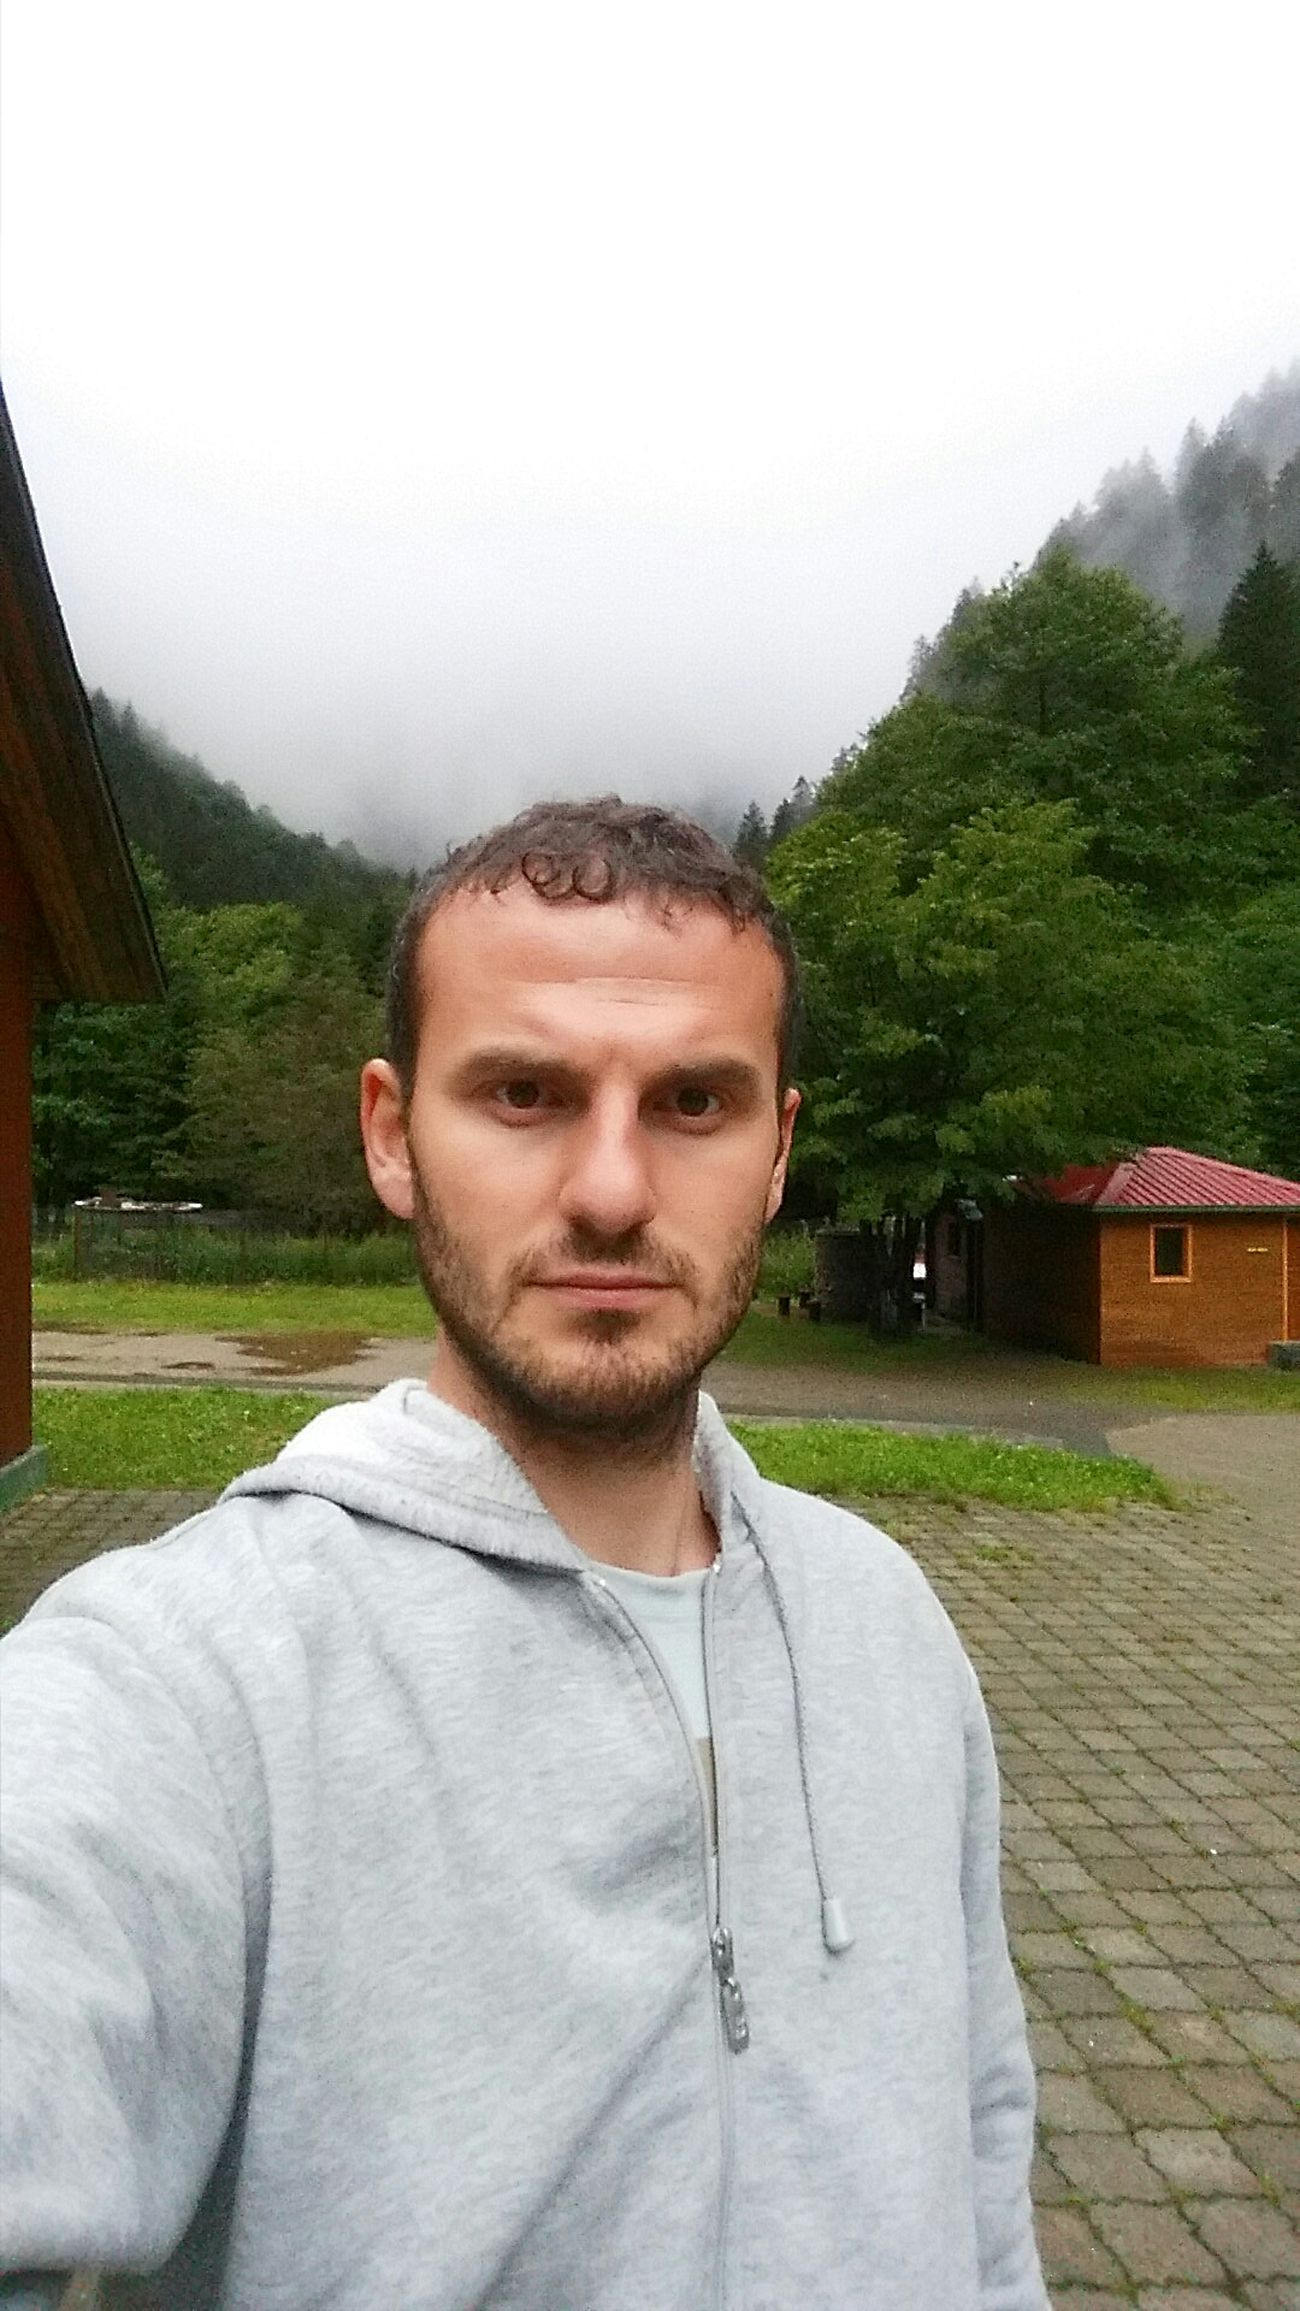 Trabzon uzungol turkey Trabzon Uzungol Turkey Huzur 💕 Yüksekrakım Sis Vadi Dağ Selfie ✌